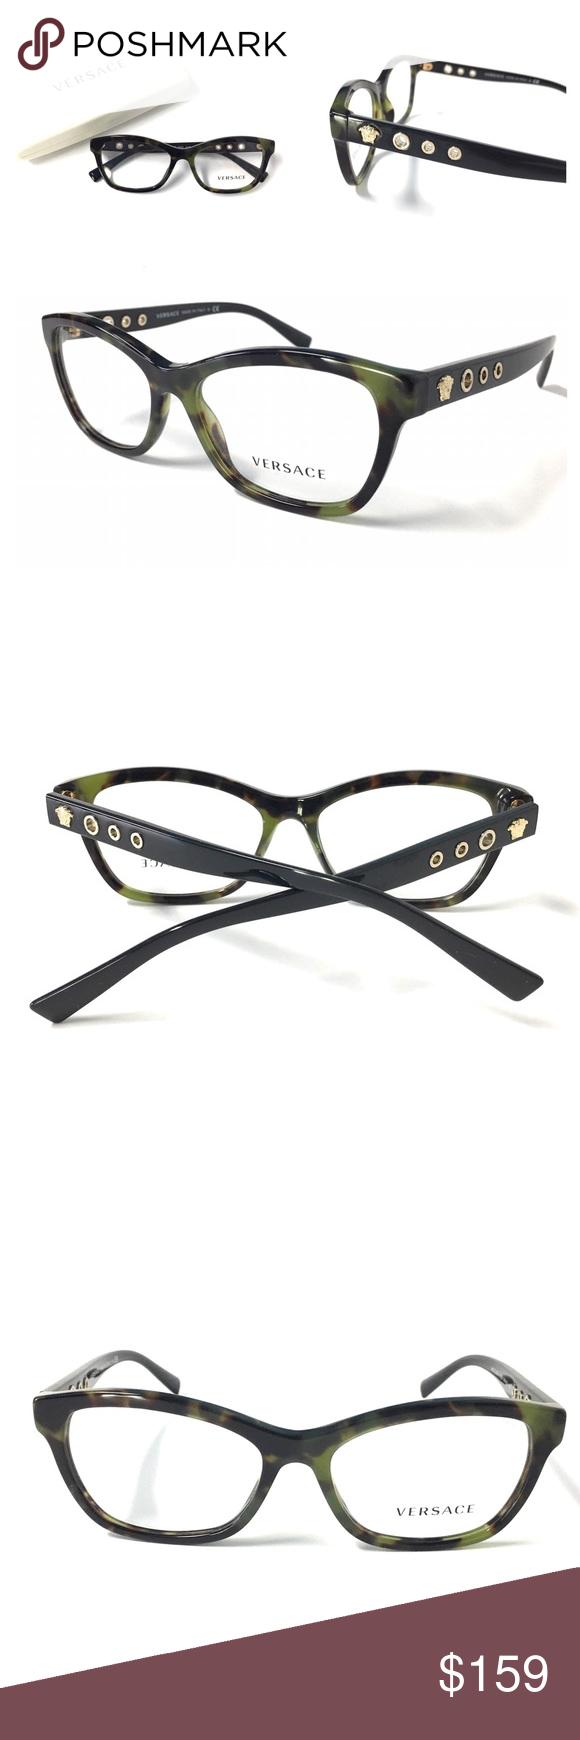 5dbbc02324cd VERSACE Women s Eyeglasses Olive Tortoise NWOT!!! VERSACE Women s Eyeglasses  Optical Frame Olive Tortoise